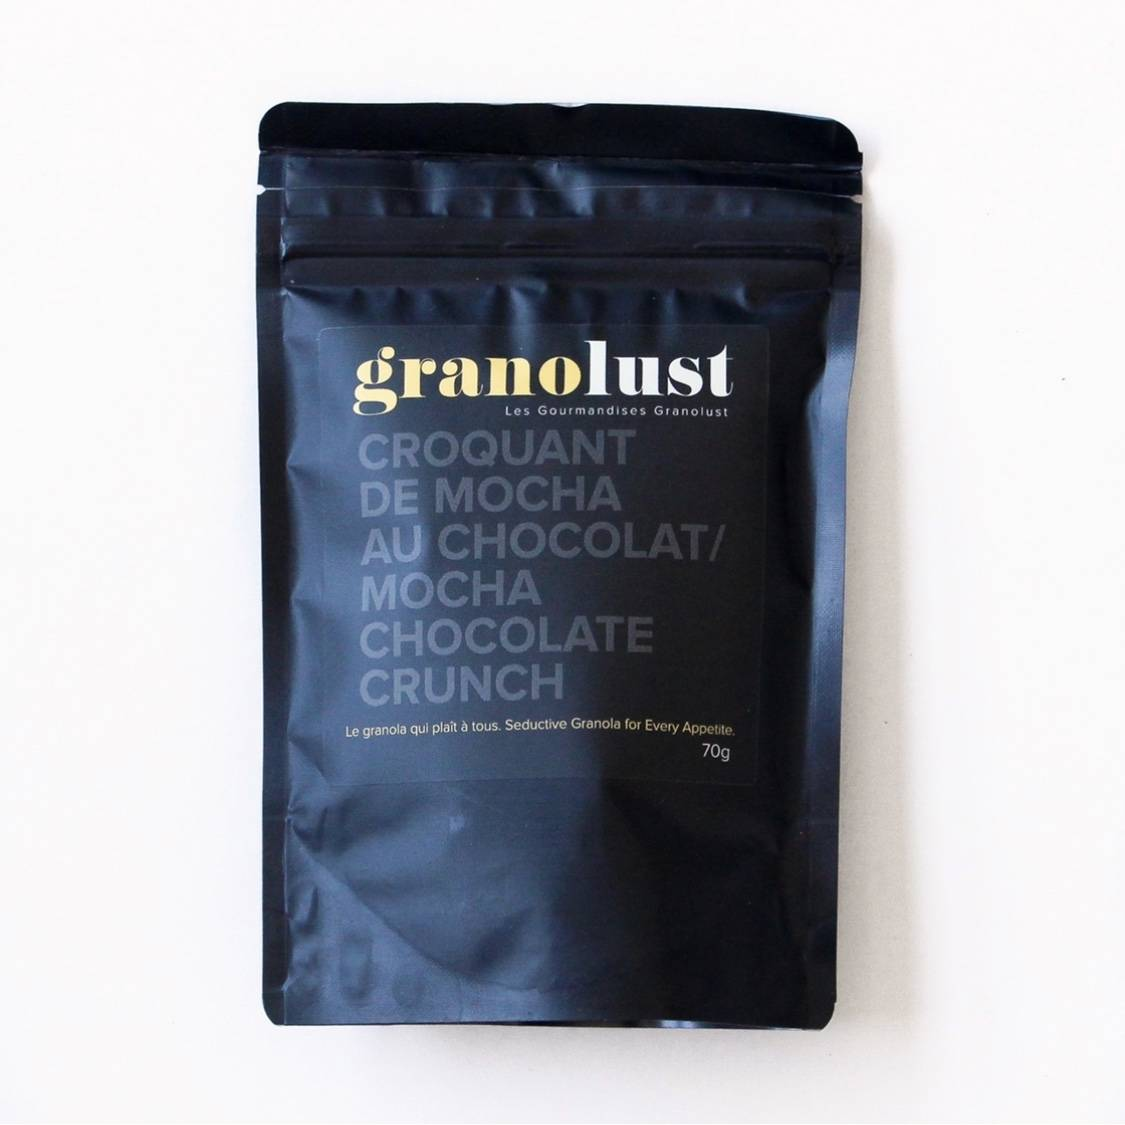 Graines choco mocha granolust